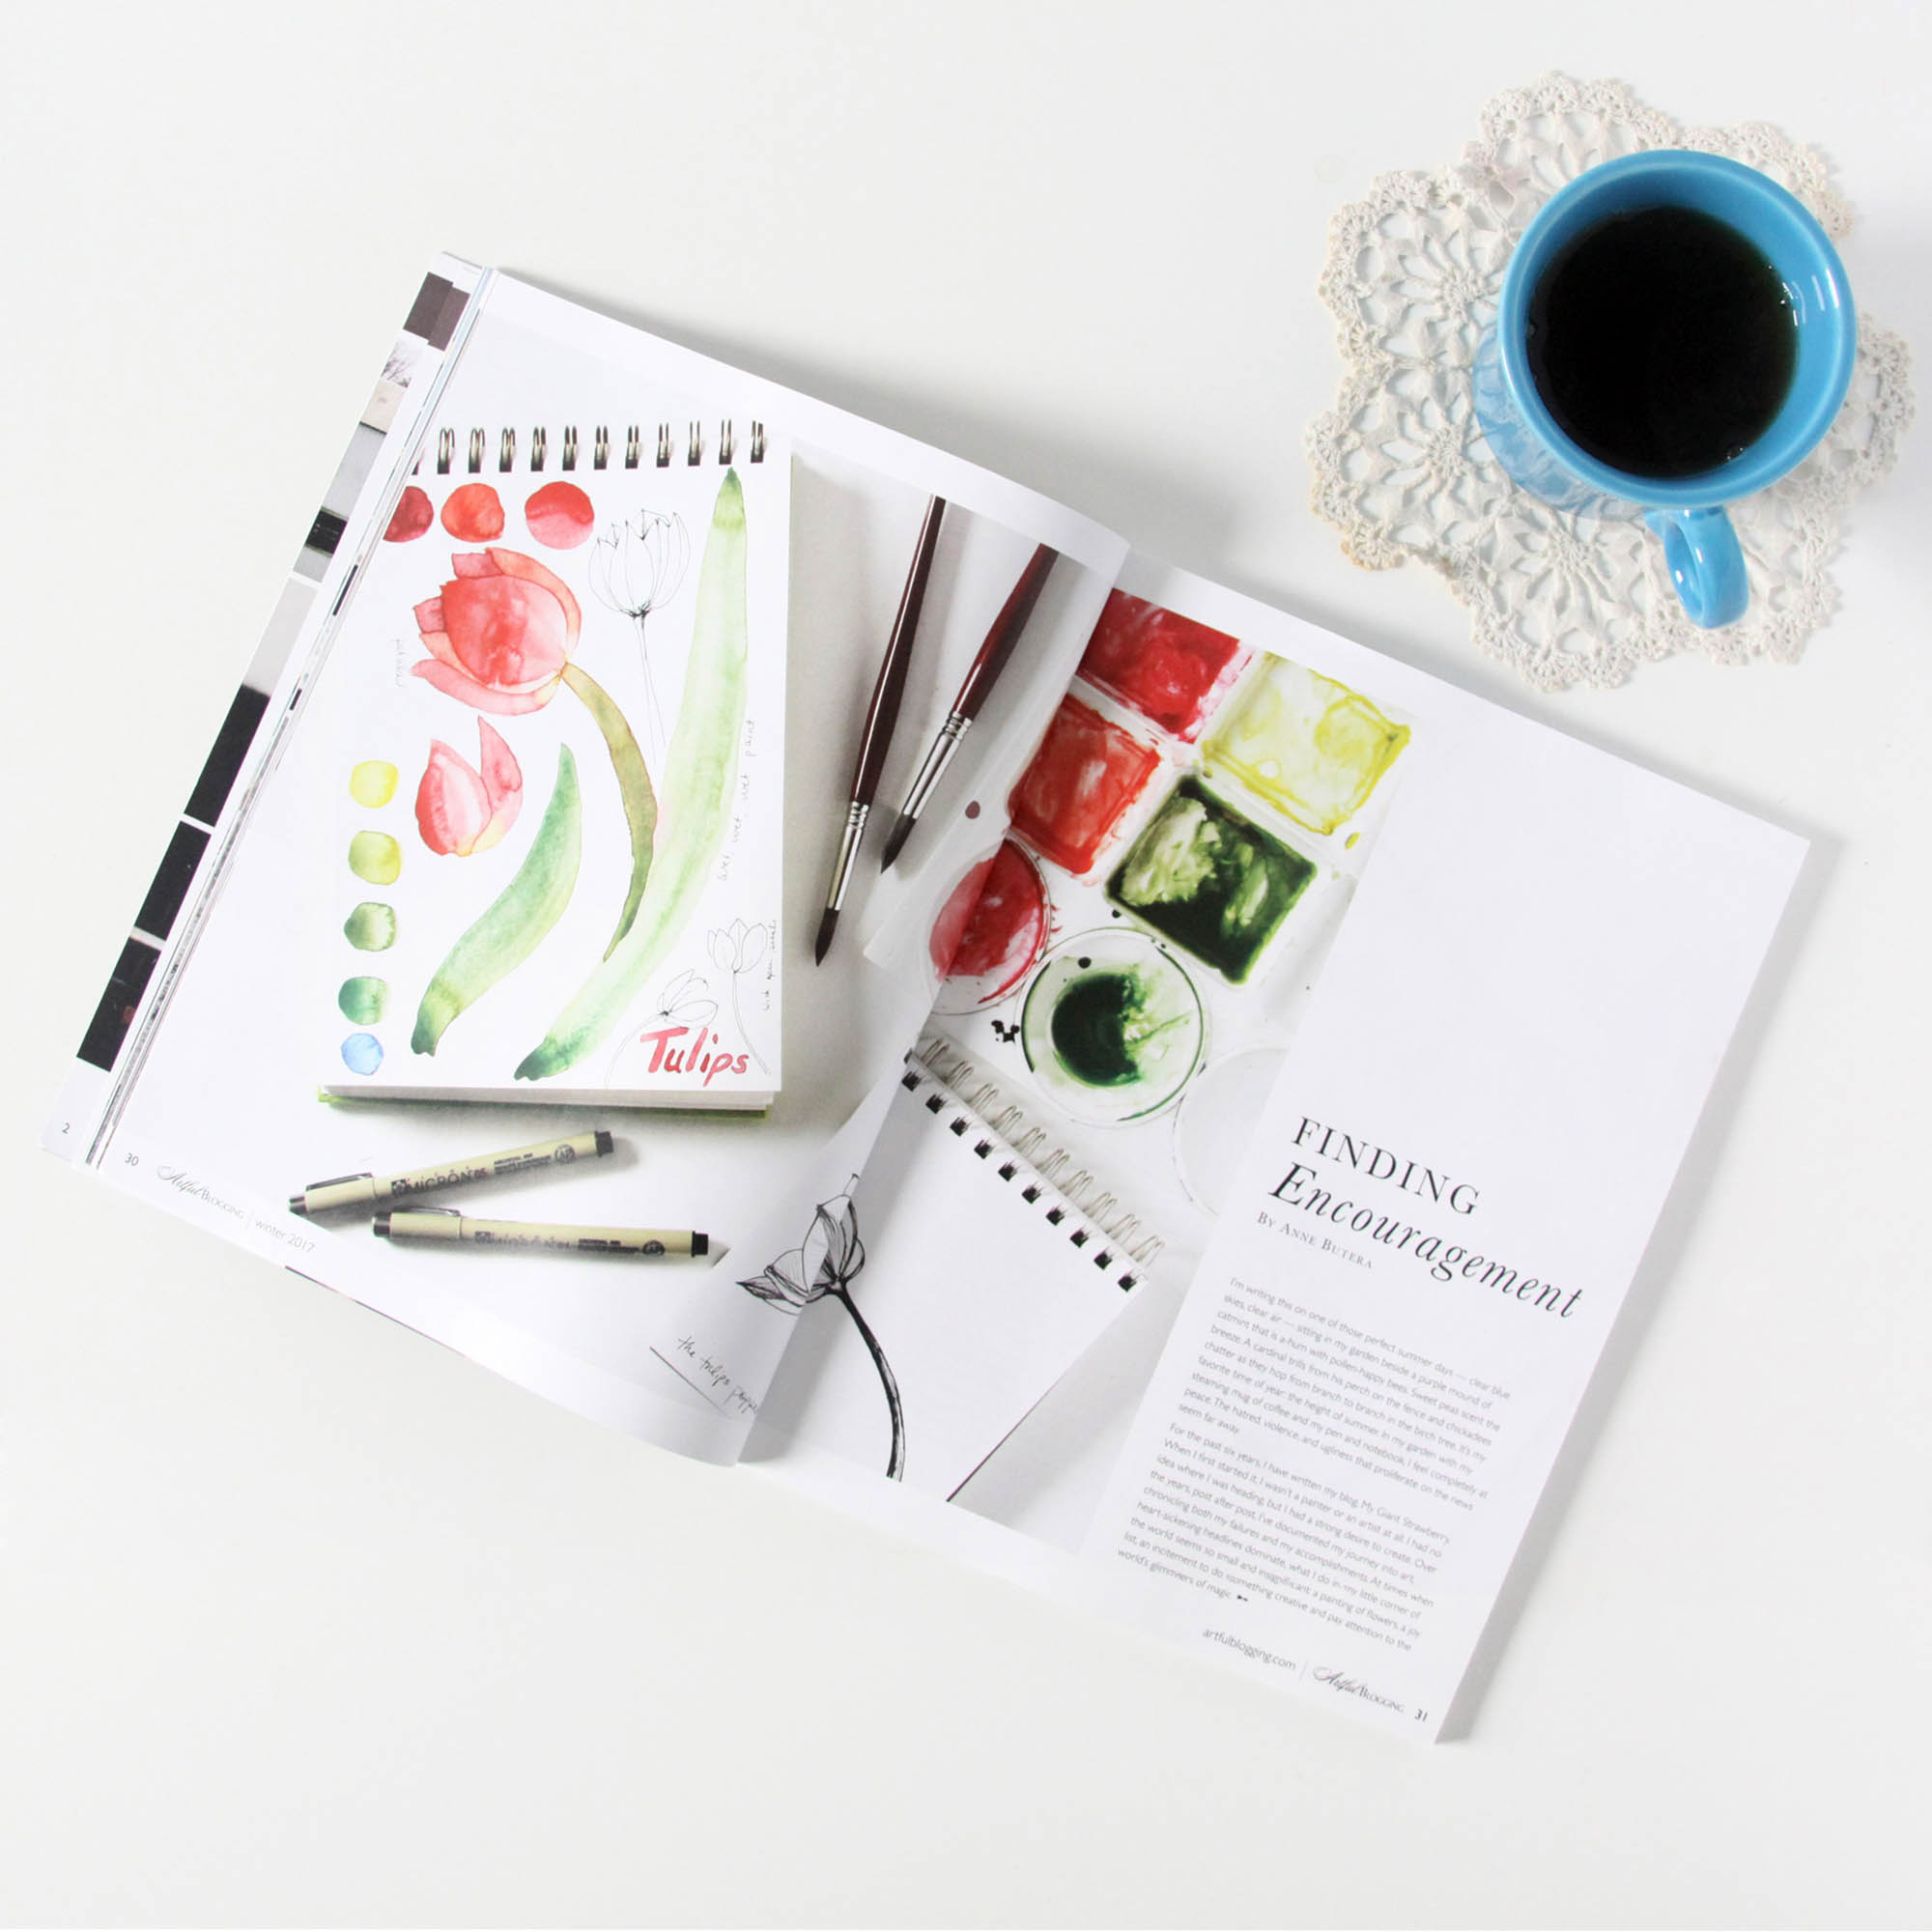 My Article in Artful Blogging Magazine